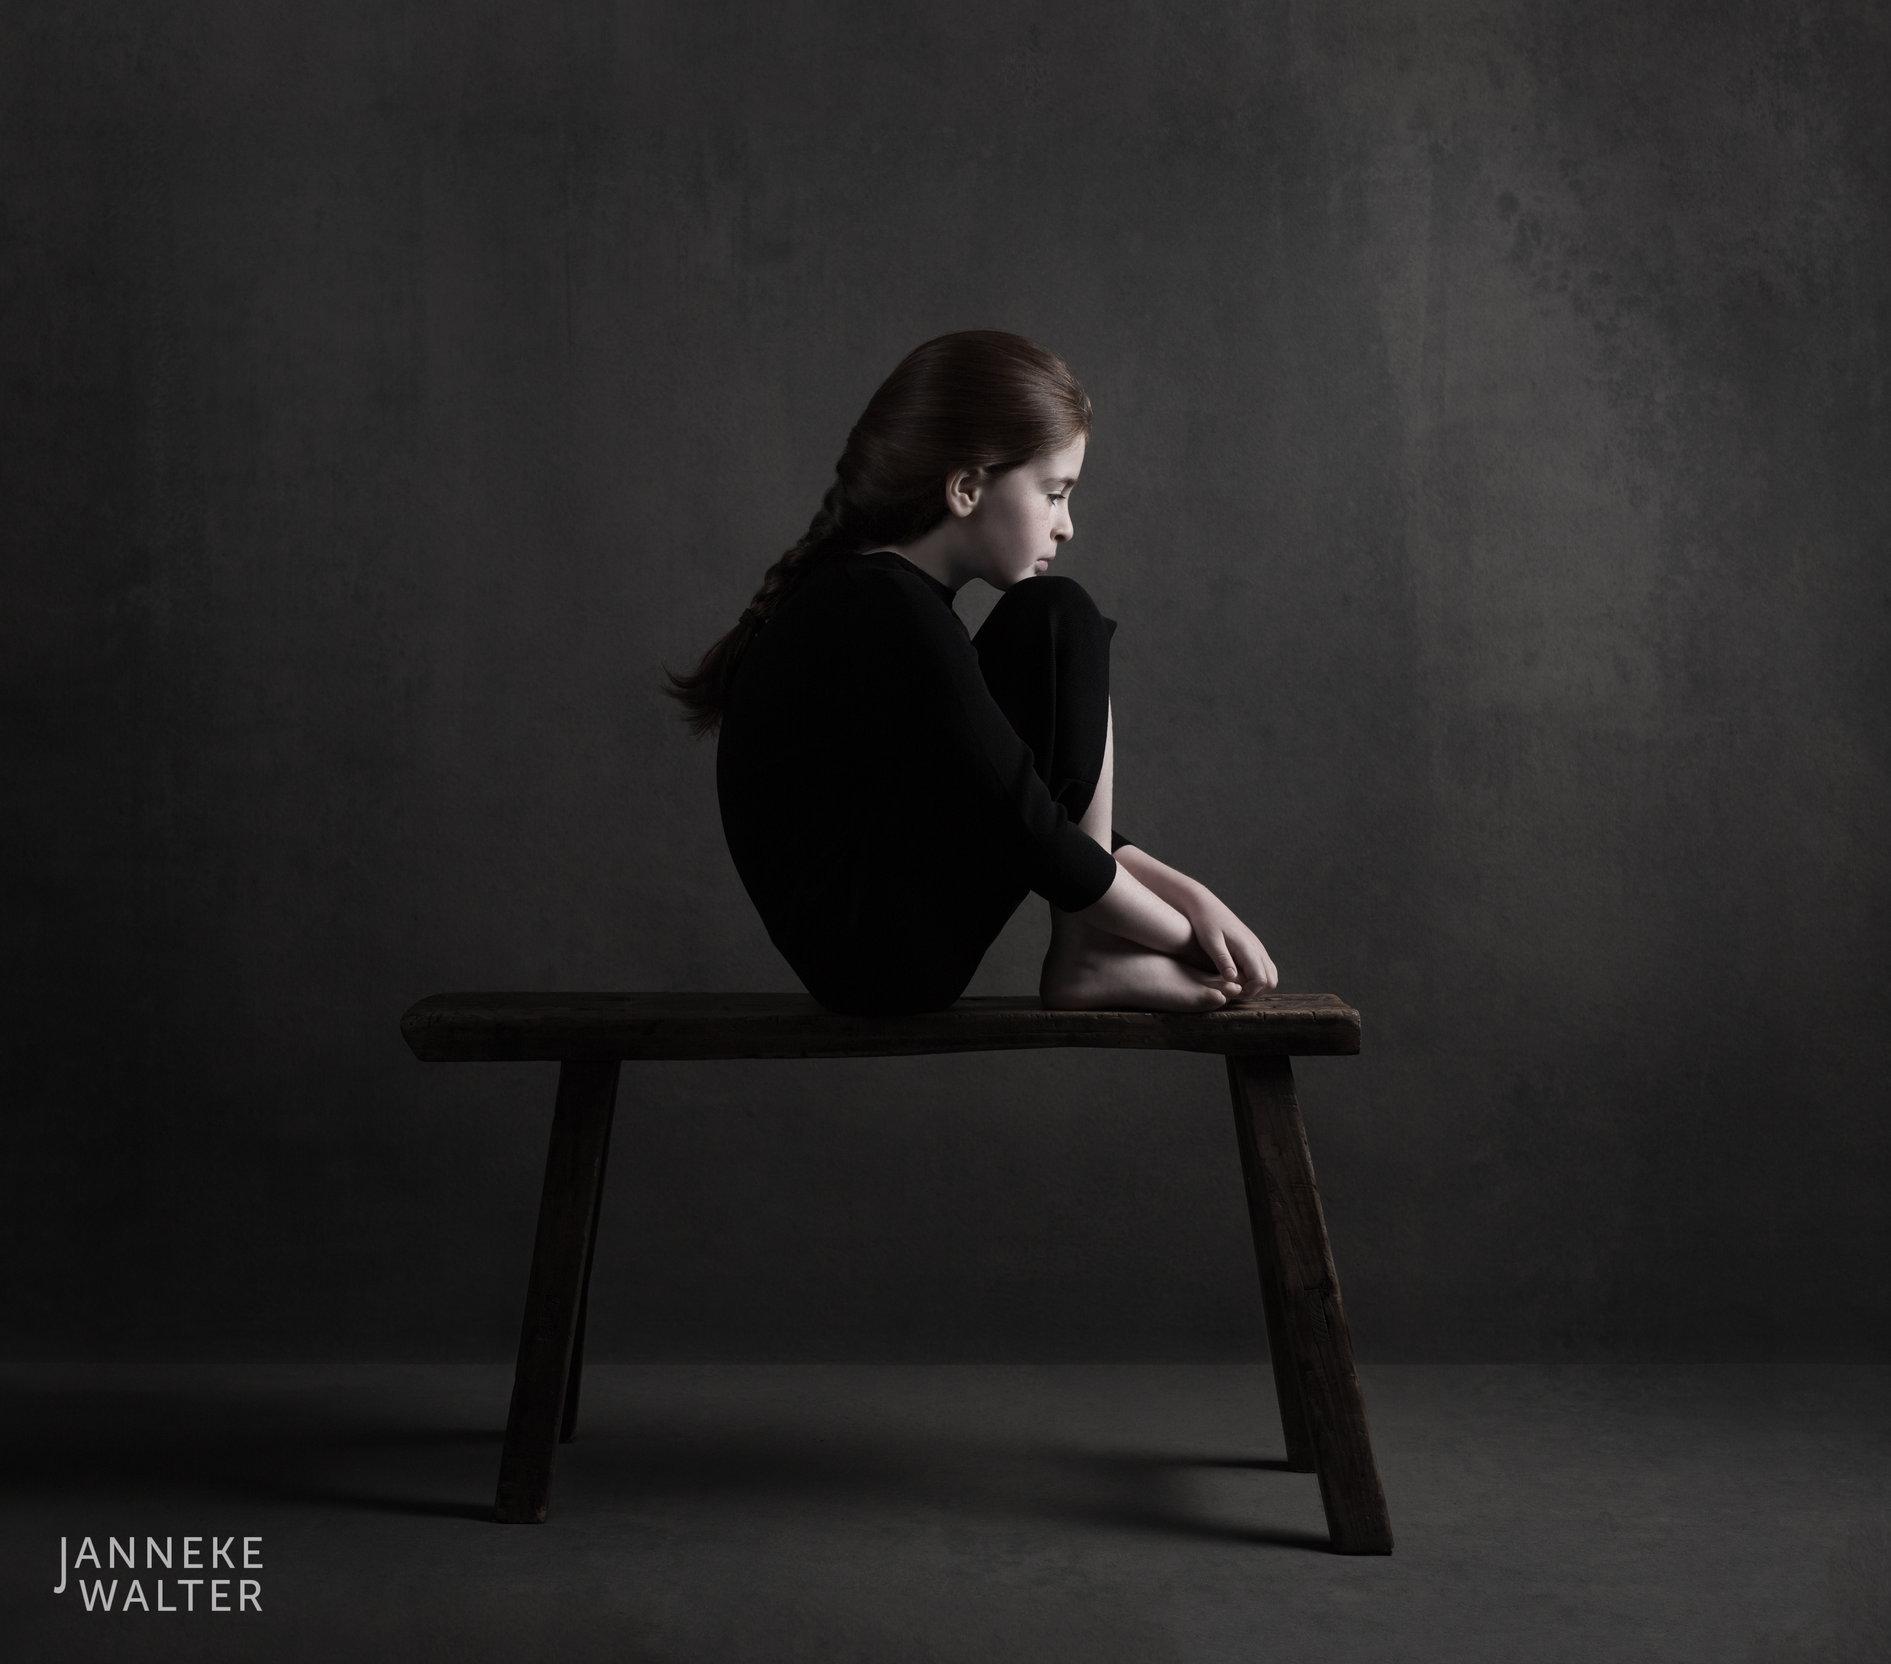 Portretfoto kind op bankje met opgetrokken knieën @ Janneke Walter, kinderfotograaf Utrecht De Bilt, kinderfotografie, kinderportret